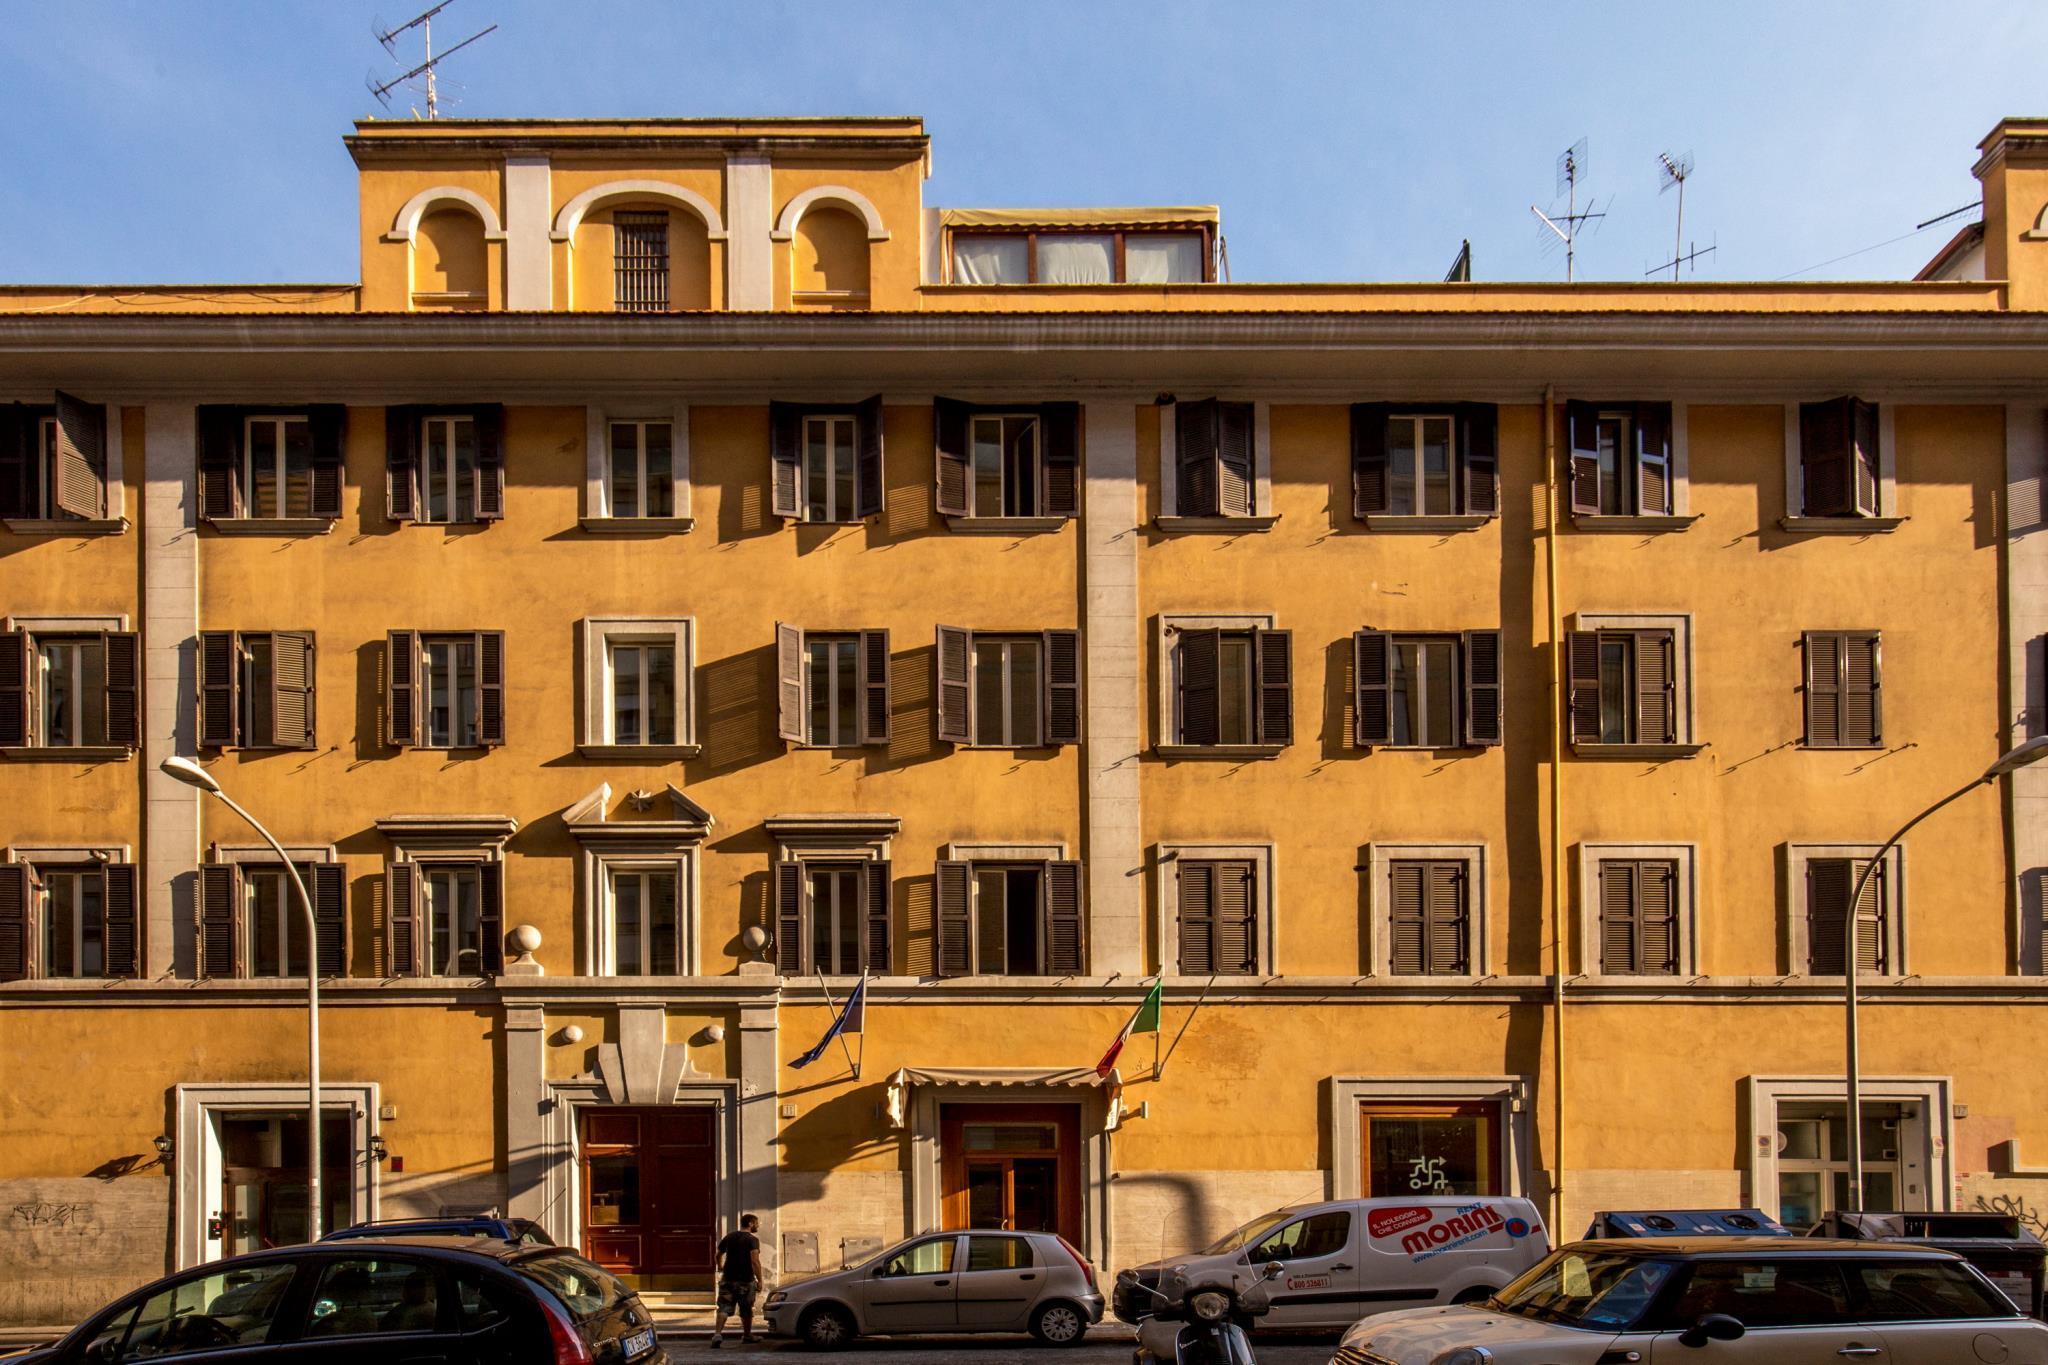 Crossroad Hotel